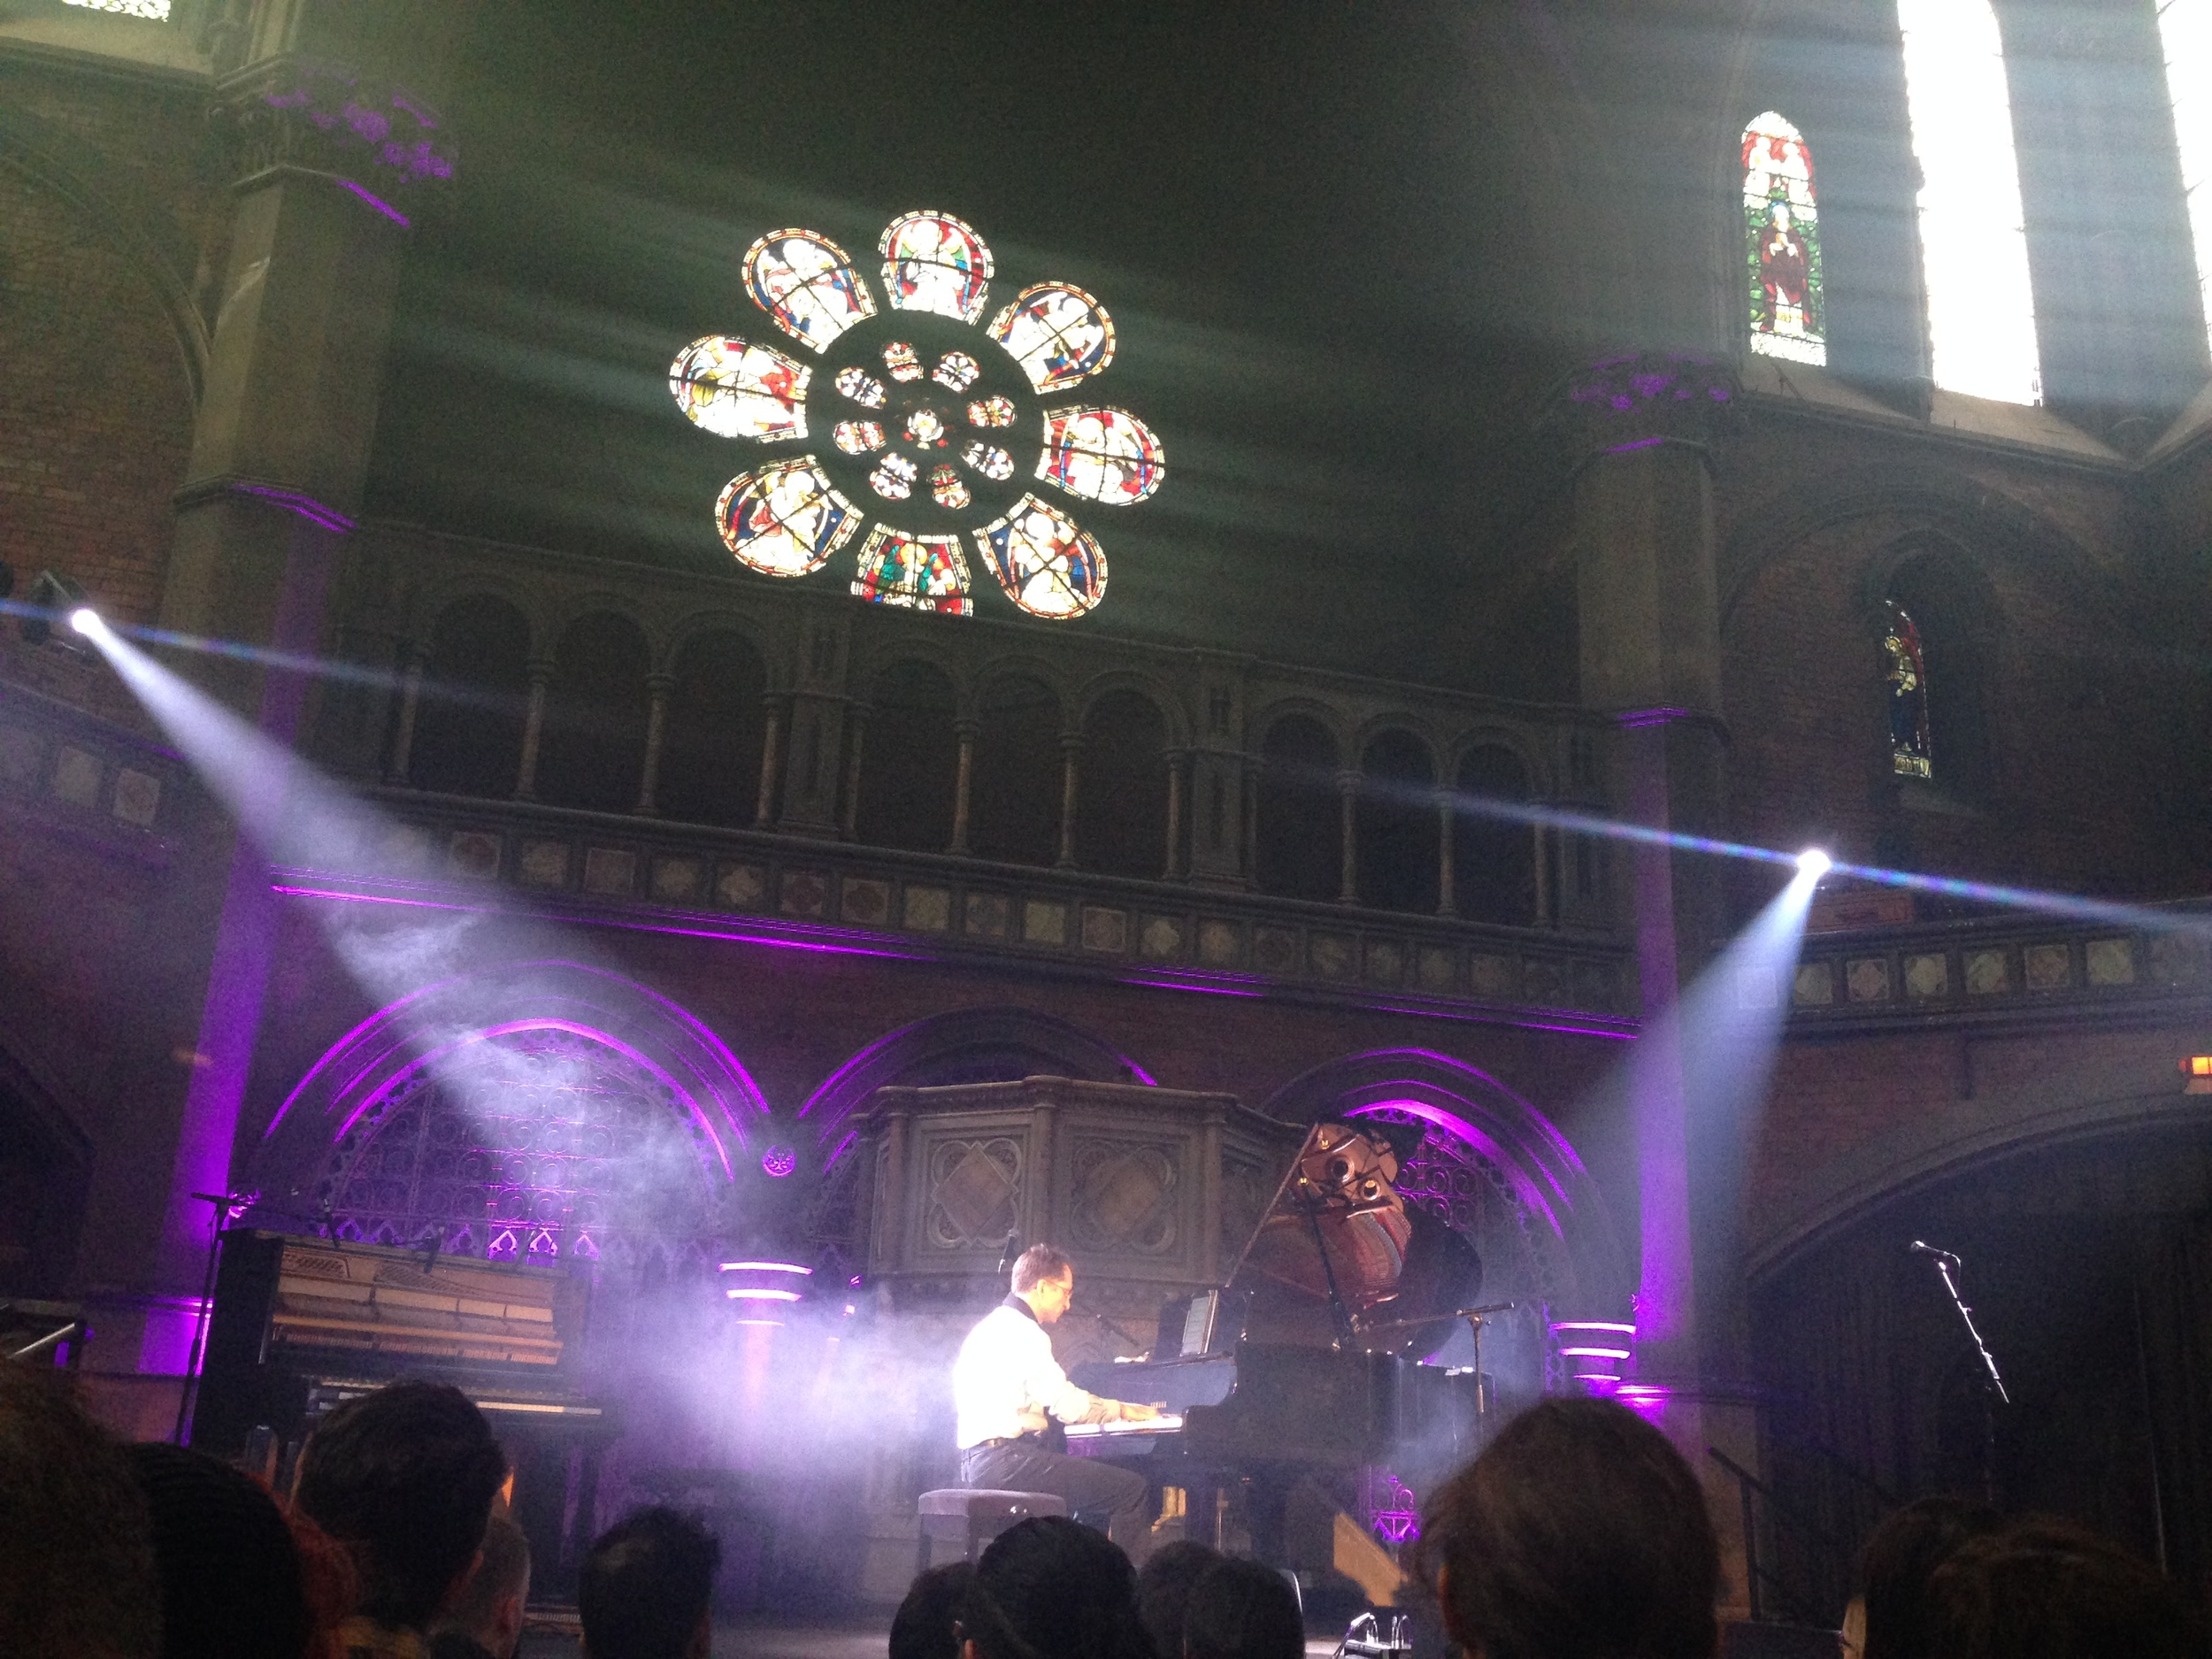 Gavin Greenaway, Daylight Music gig for Piano Day, Union Chapel, Islington, London 26 March 2016